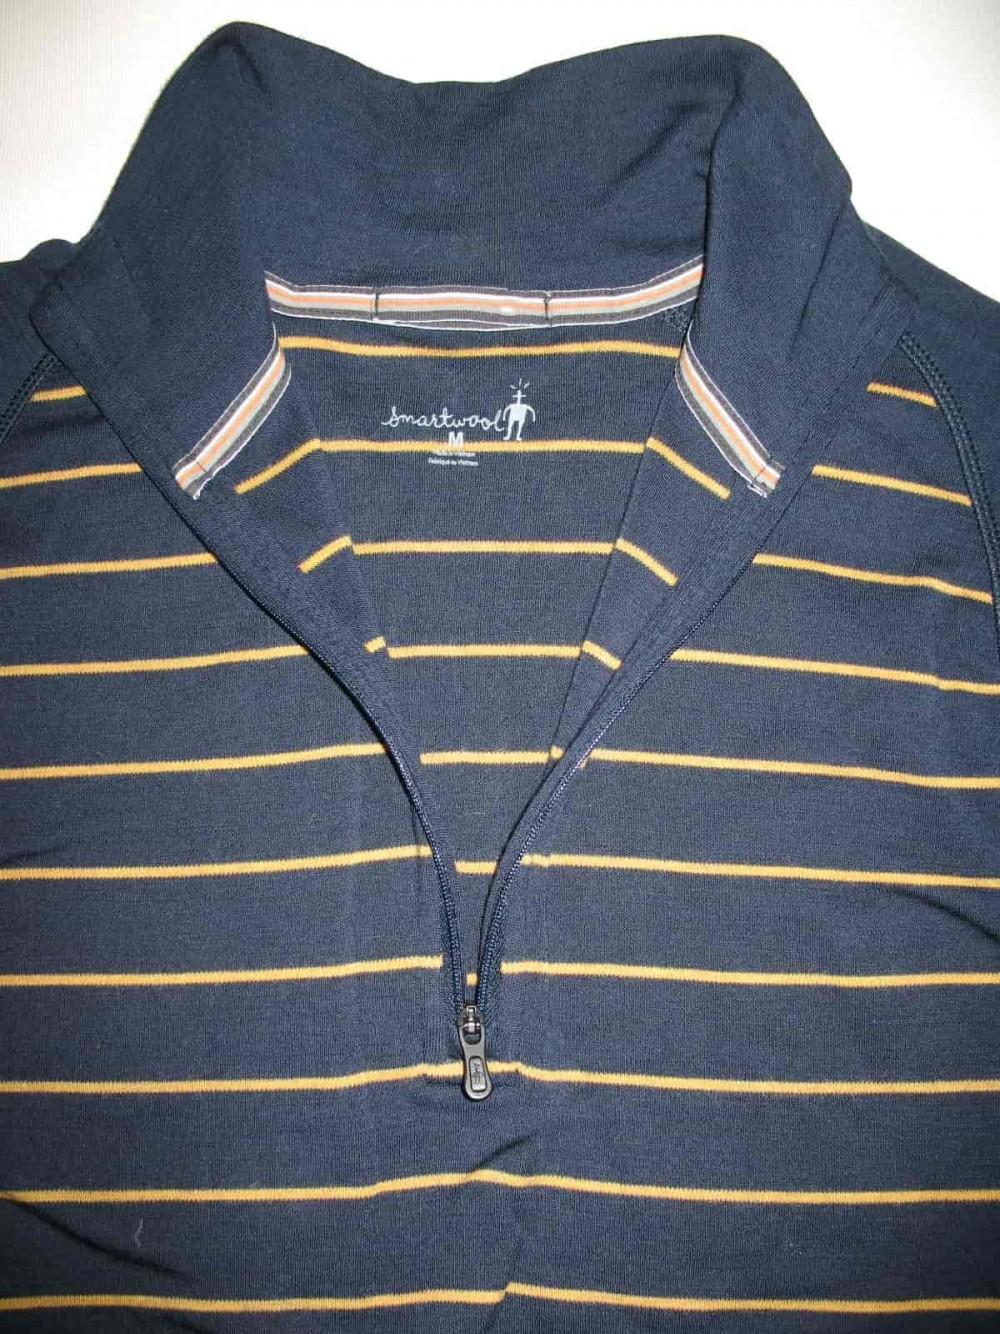 Кофта SMARTWOOL merino 250 base layer 1/4 zip navy jersey (размер М) - 4